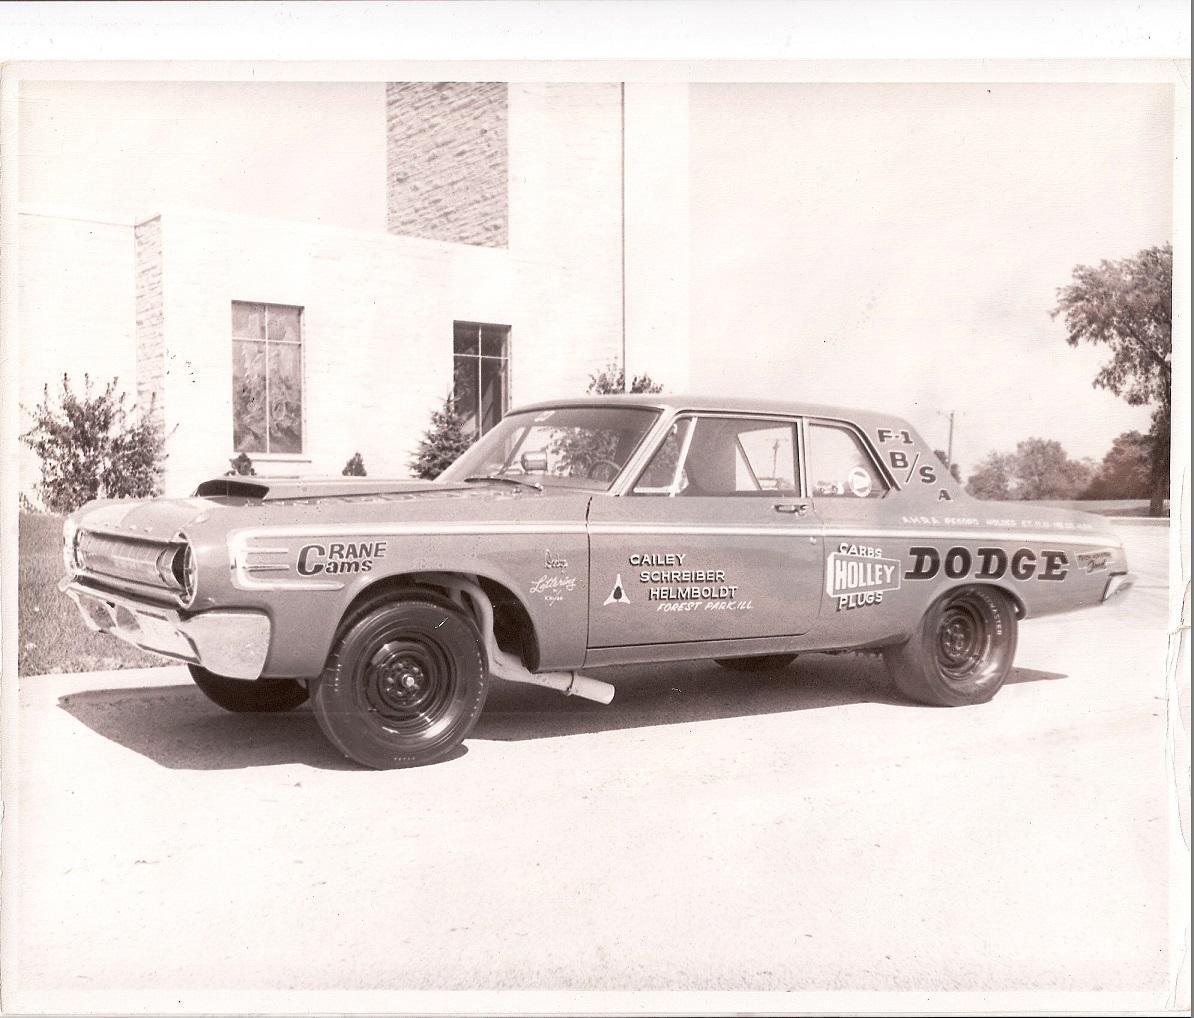 64 Dodge.jpg